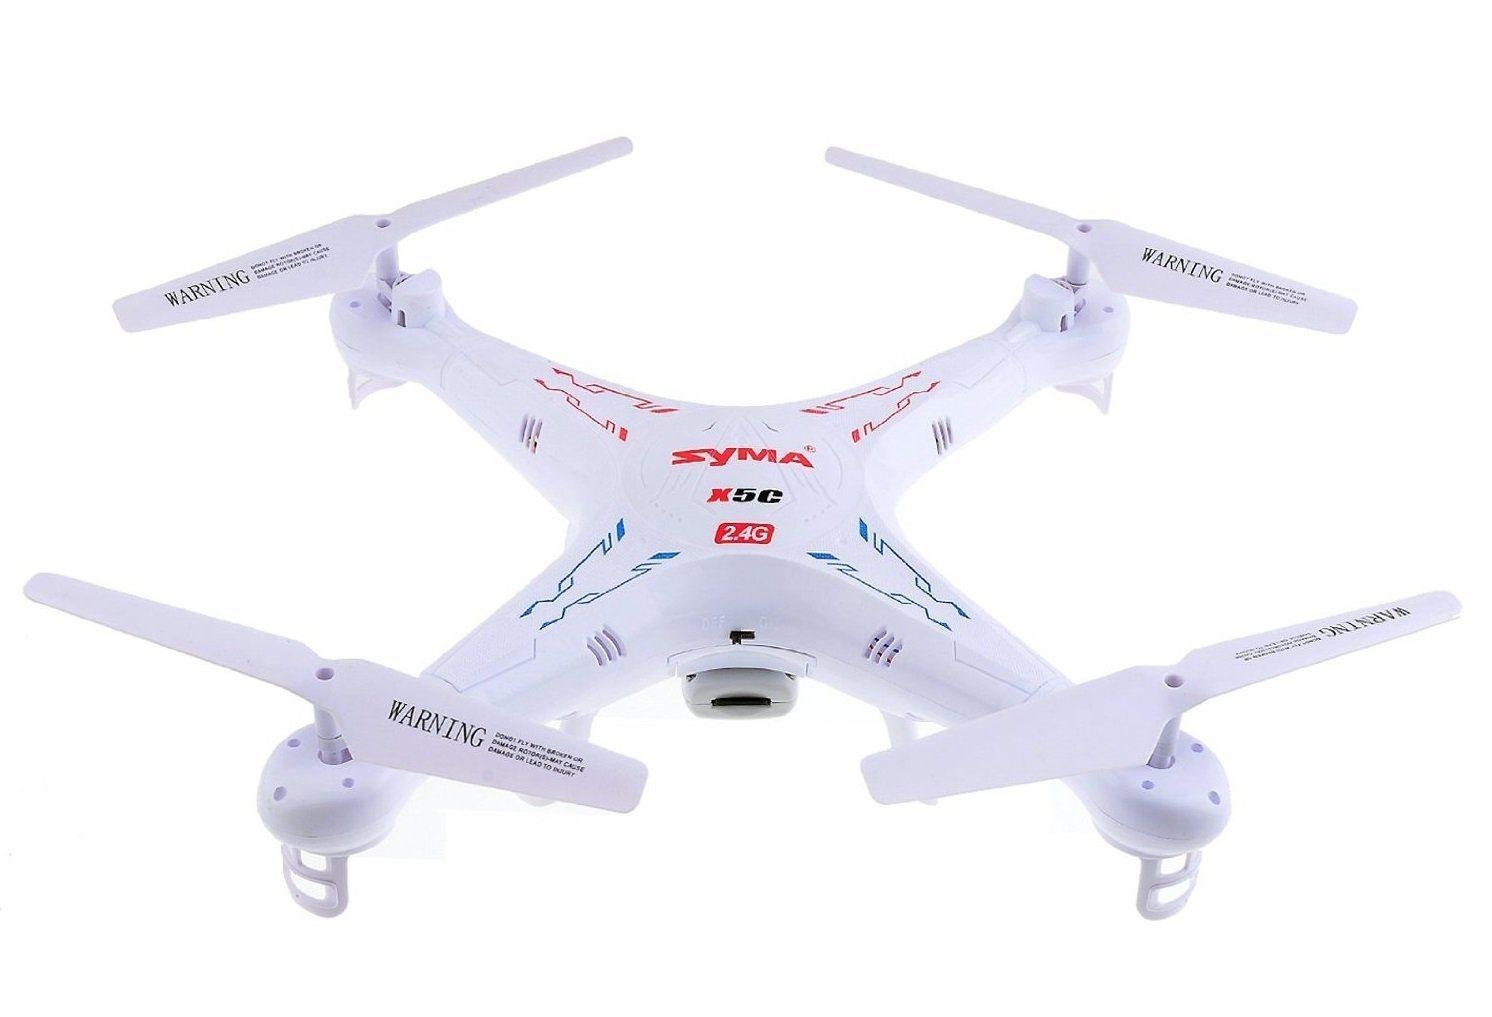 61yasO5d0OL. SL1492  - Syma X5C Explorers 2.4G 4CH 6-Axis Gyro RC Quadcopter With HD Camera